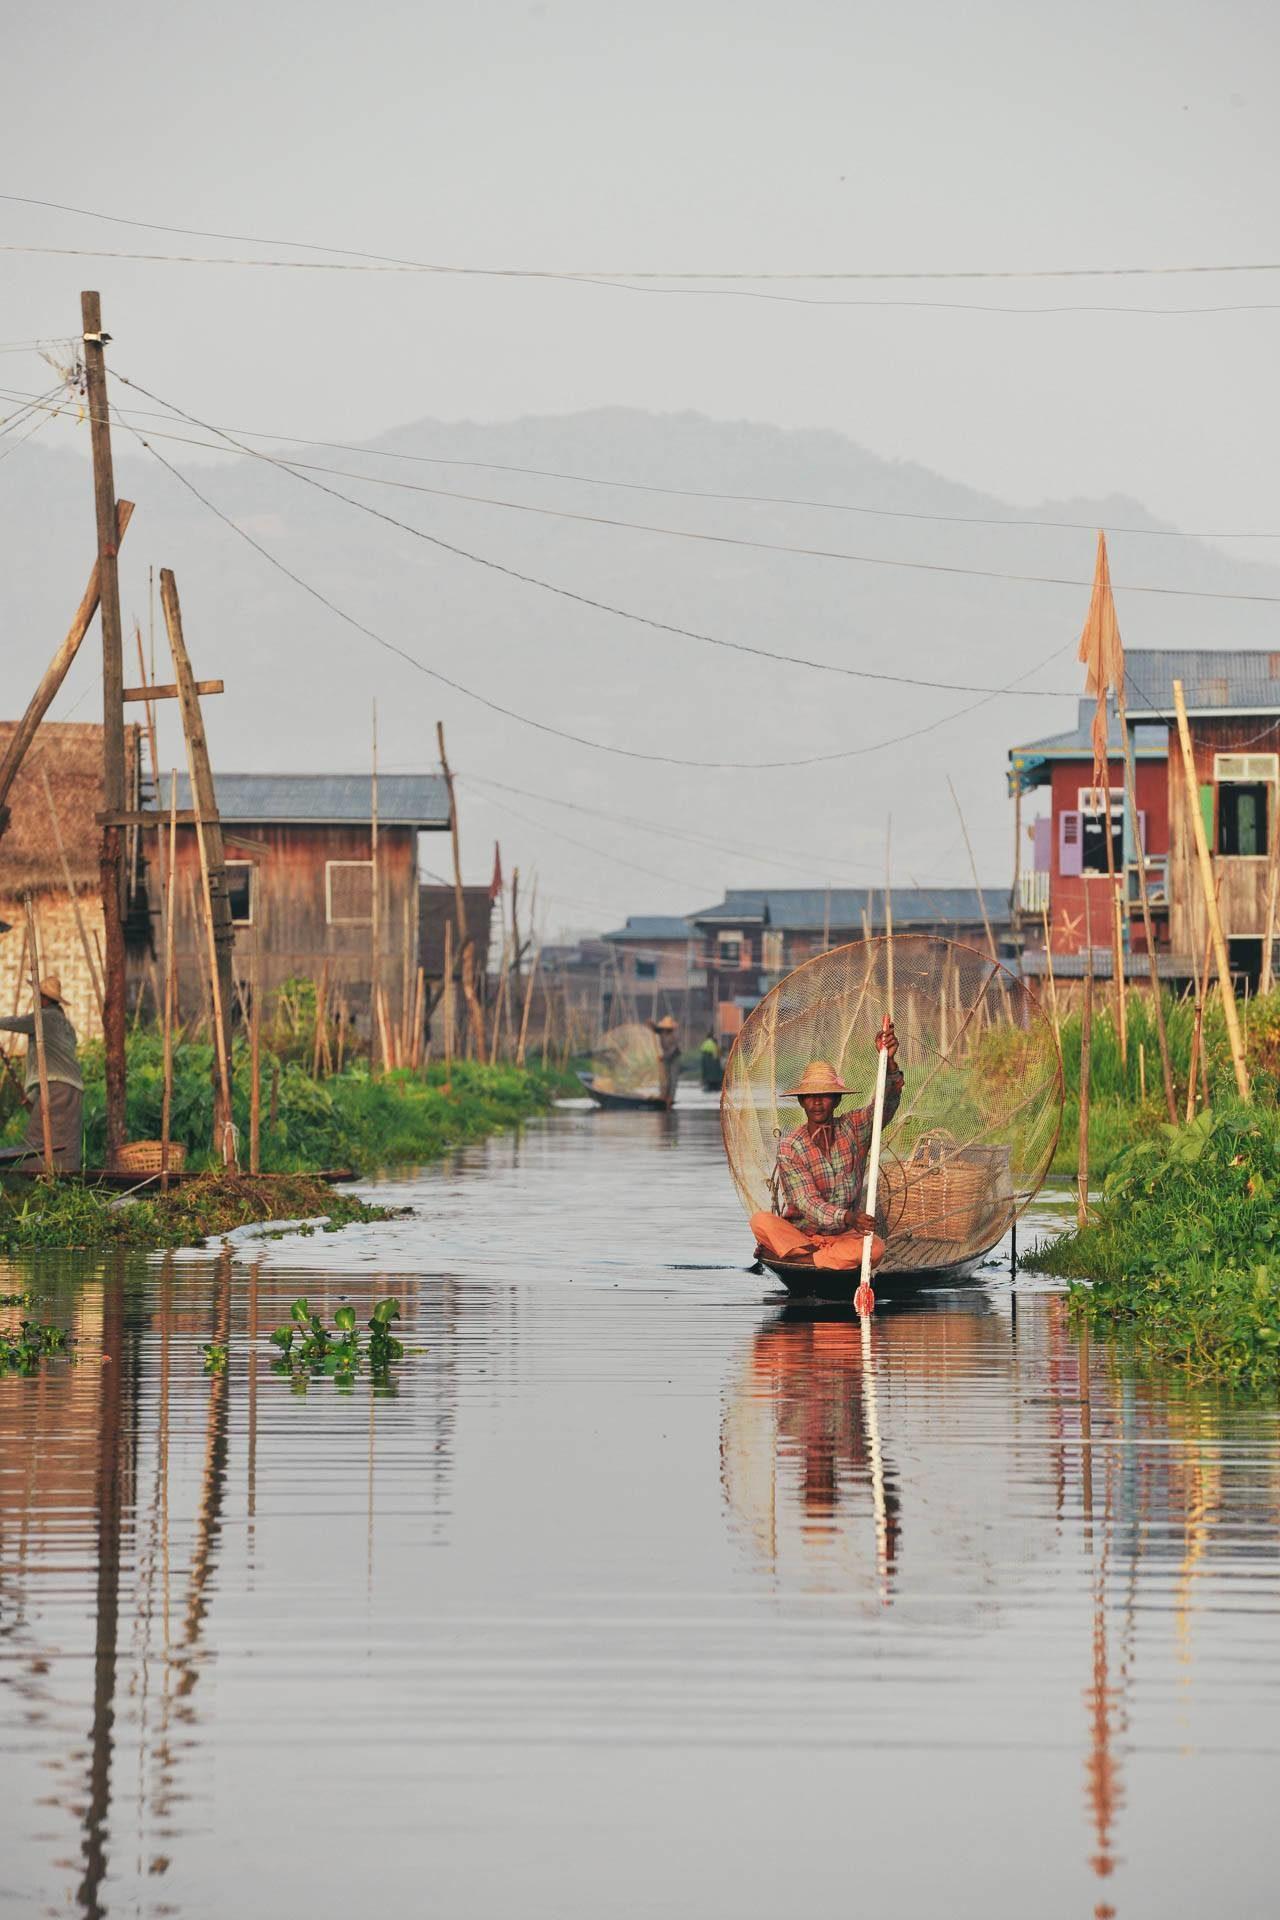 Mann Boot Fluss Myanmar Fotostory von Nils Junker